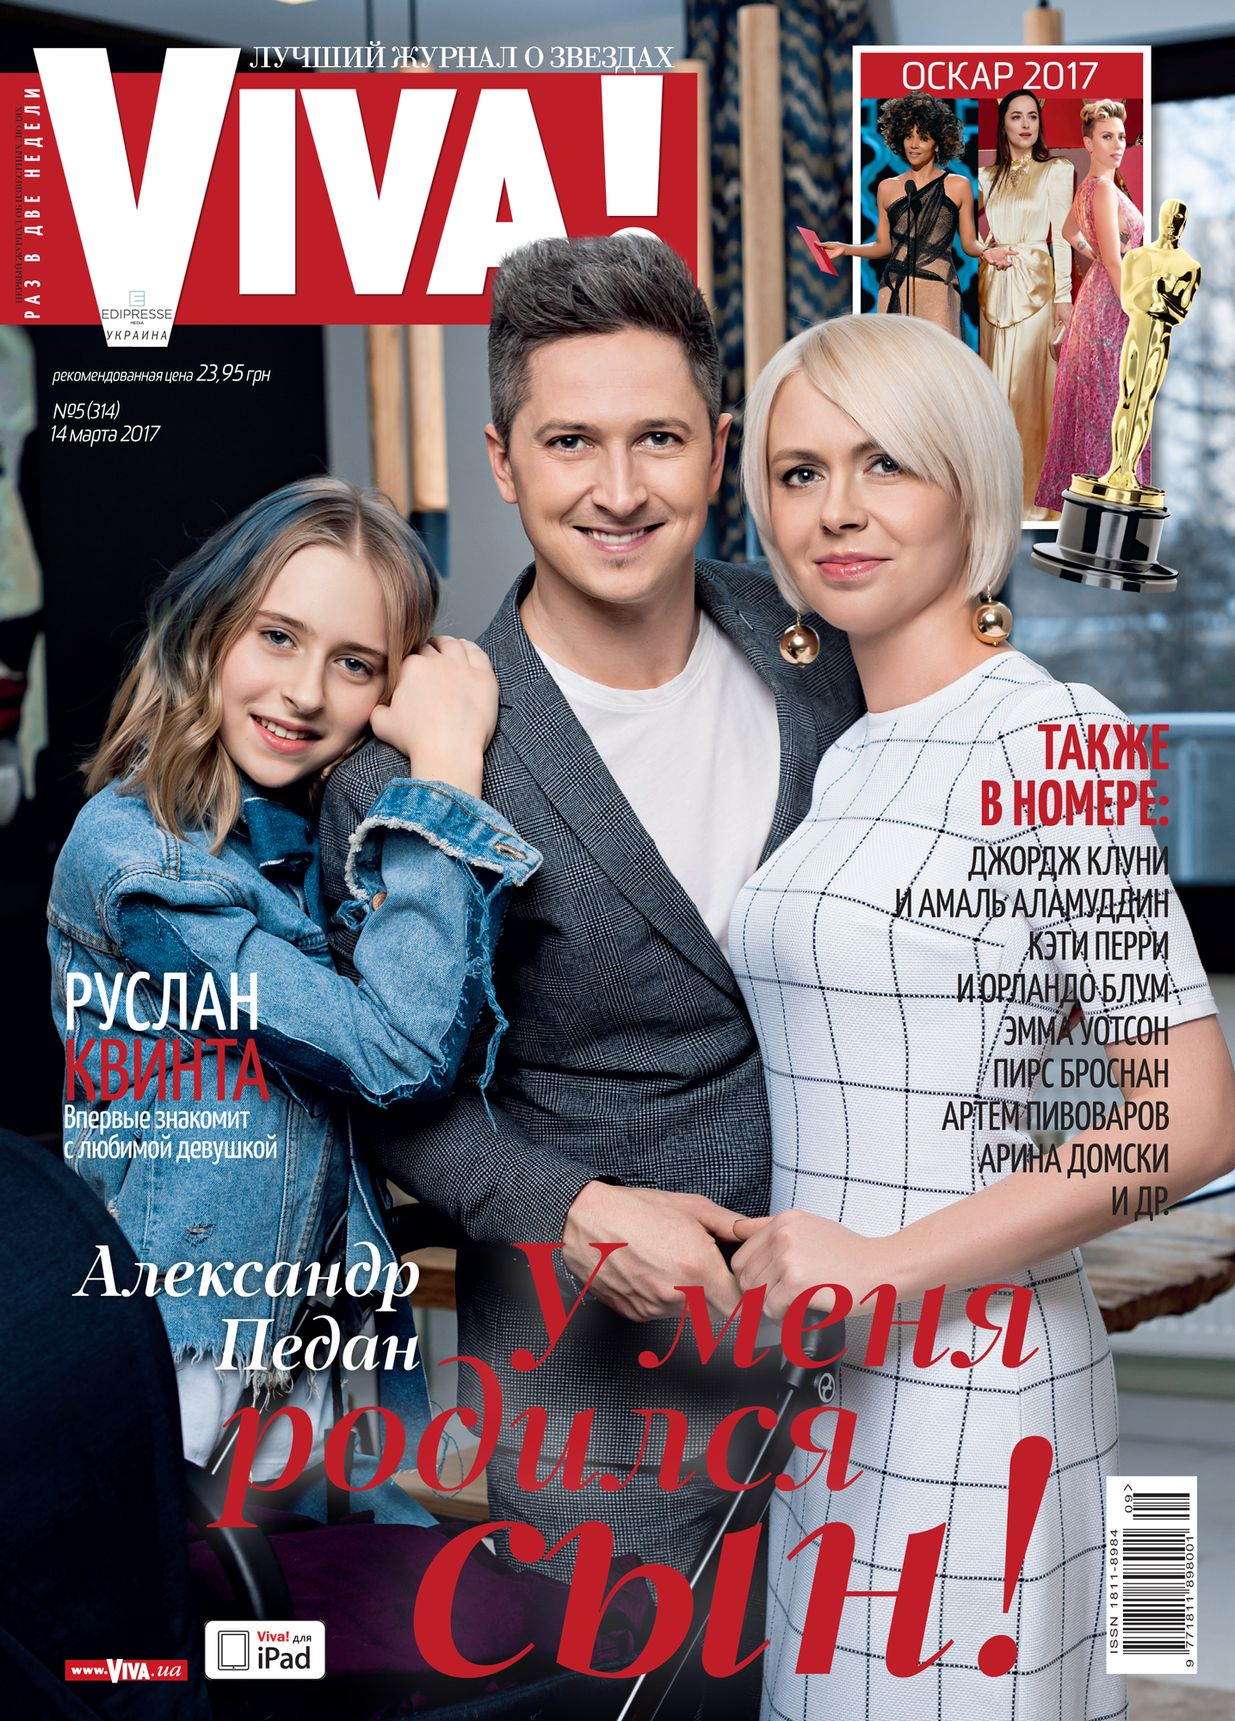 Александр Педан с женой и дочерью на обложке журнала Viva!